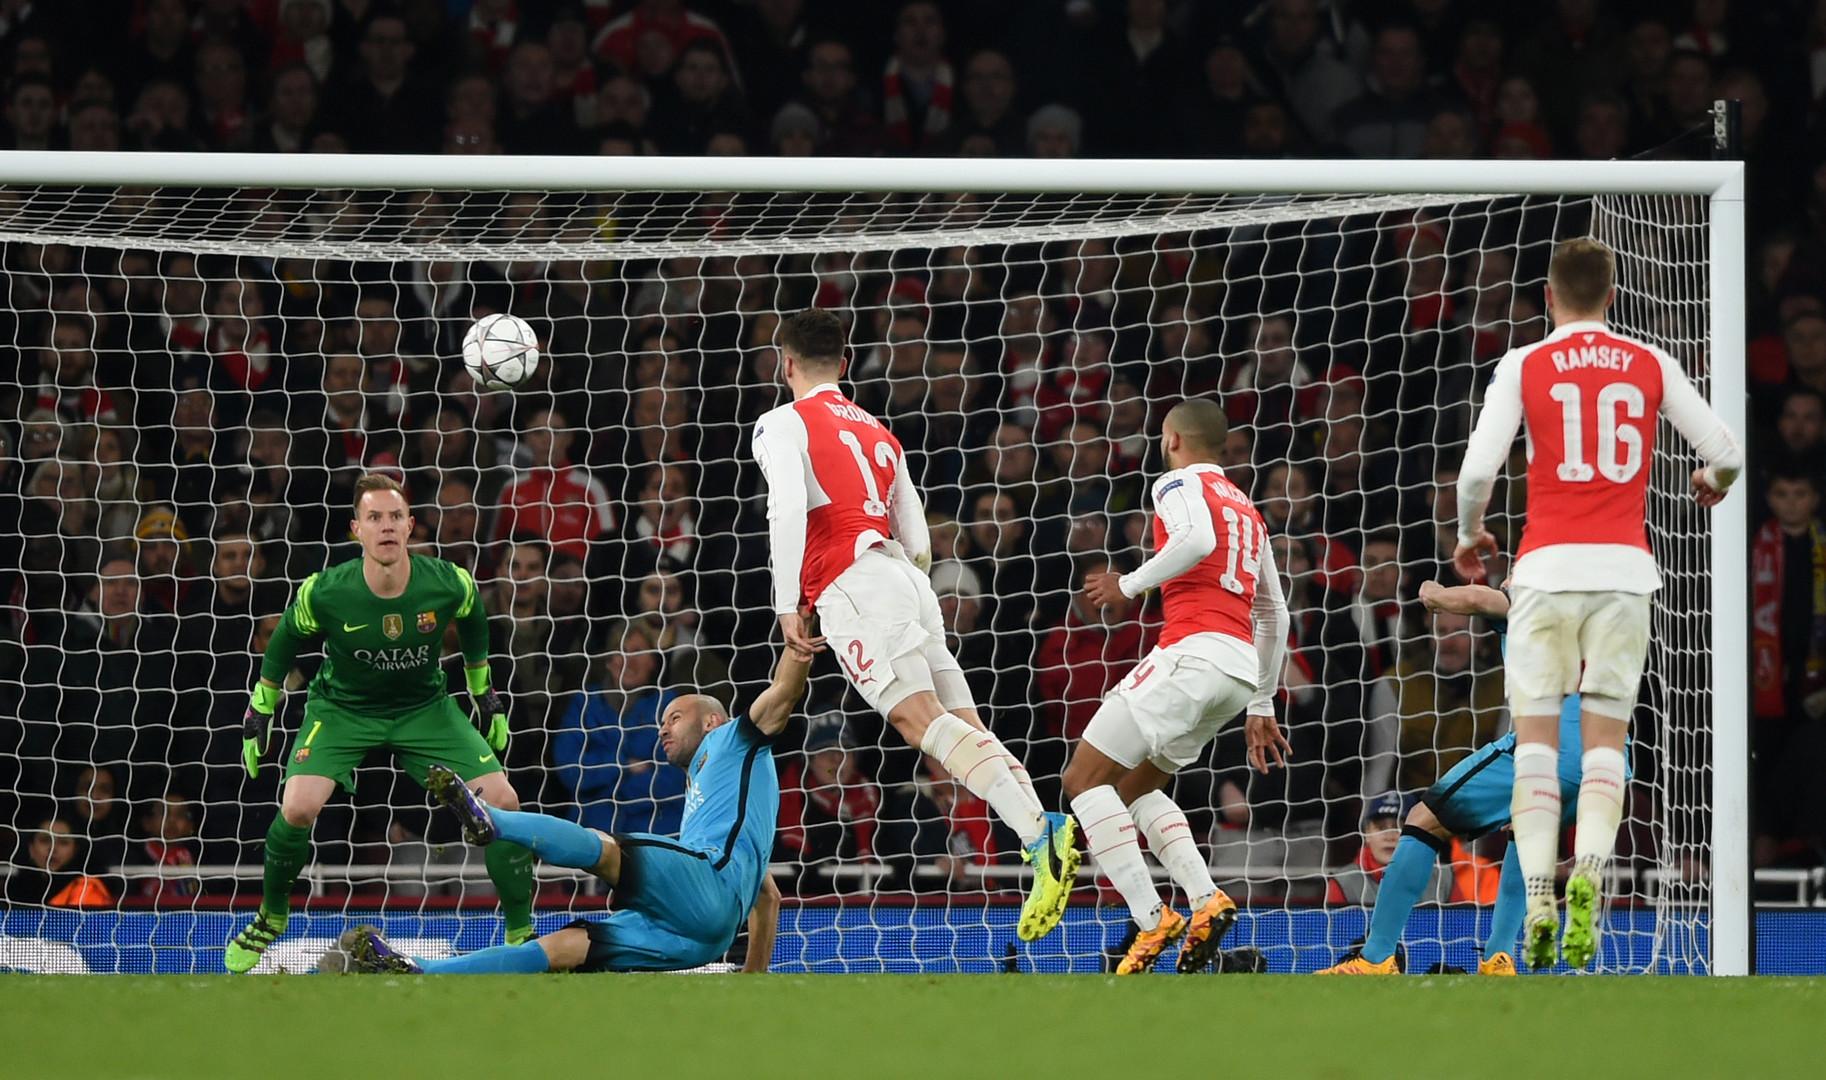 Arsenal Stürmer Olivier Giroud köpft den Ball auf das Tor von Barca Torwart Marc-Andre Ter Stegen.